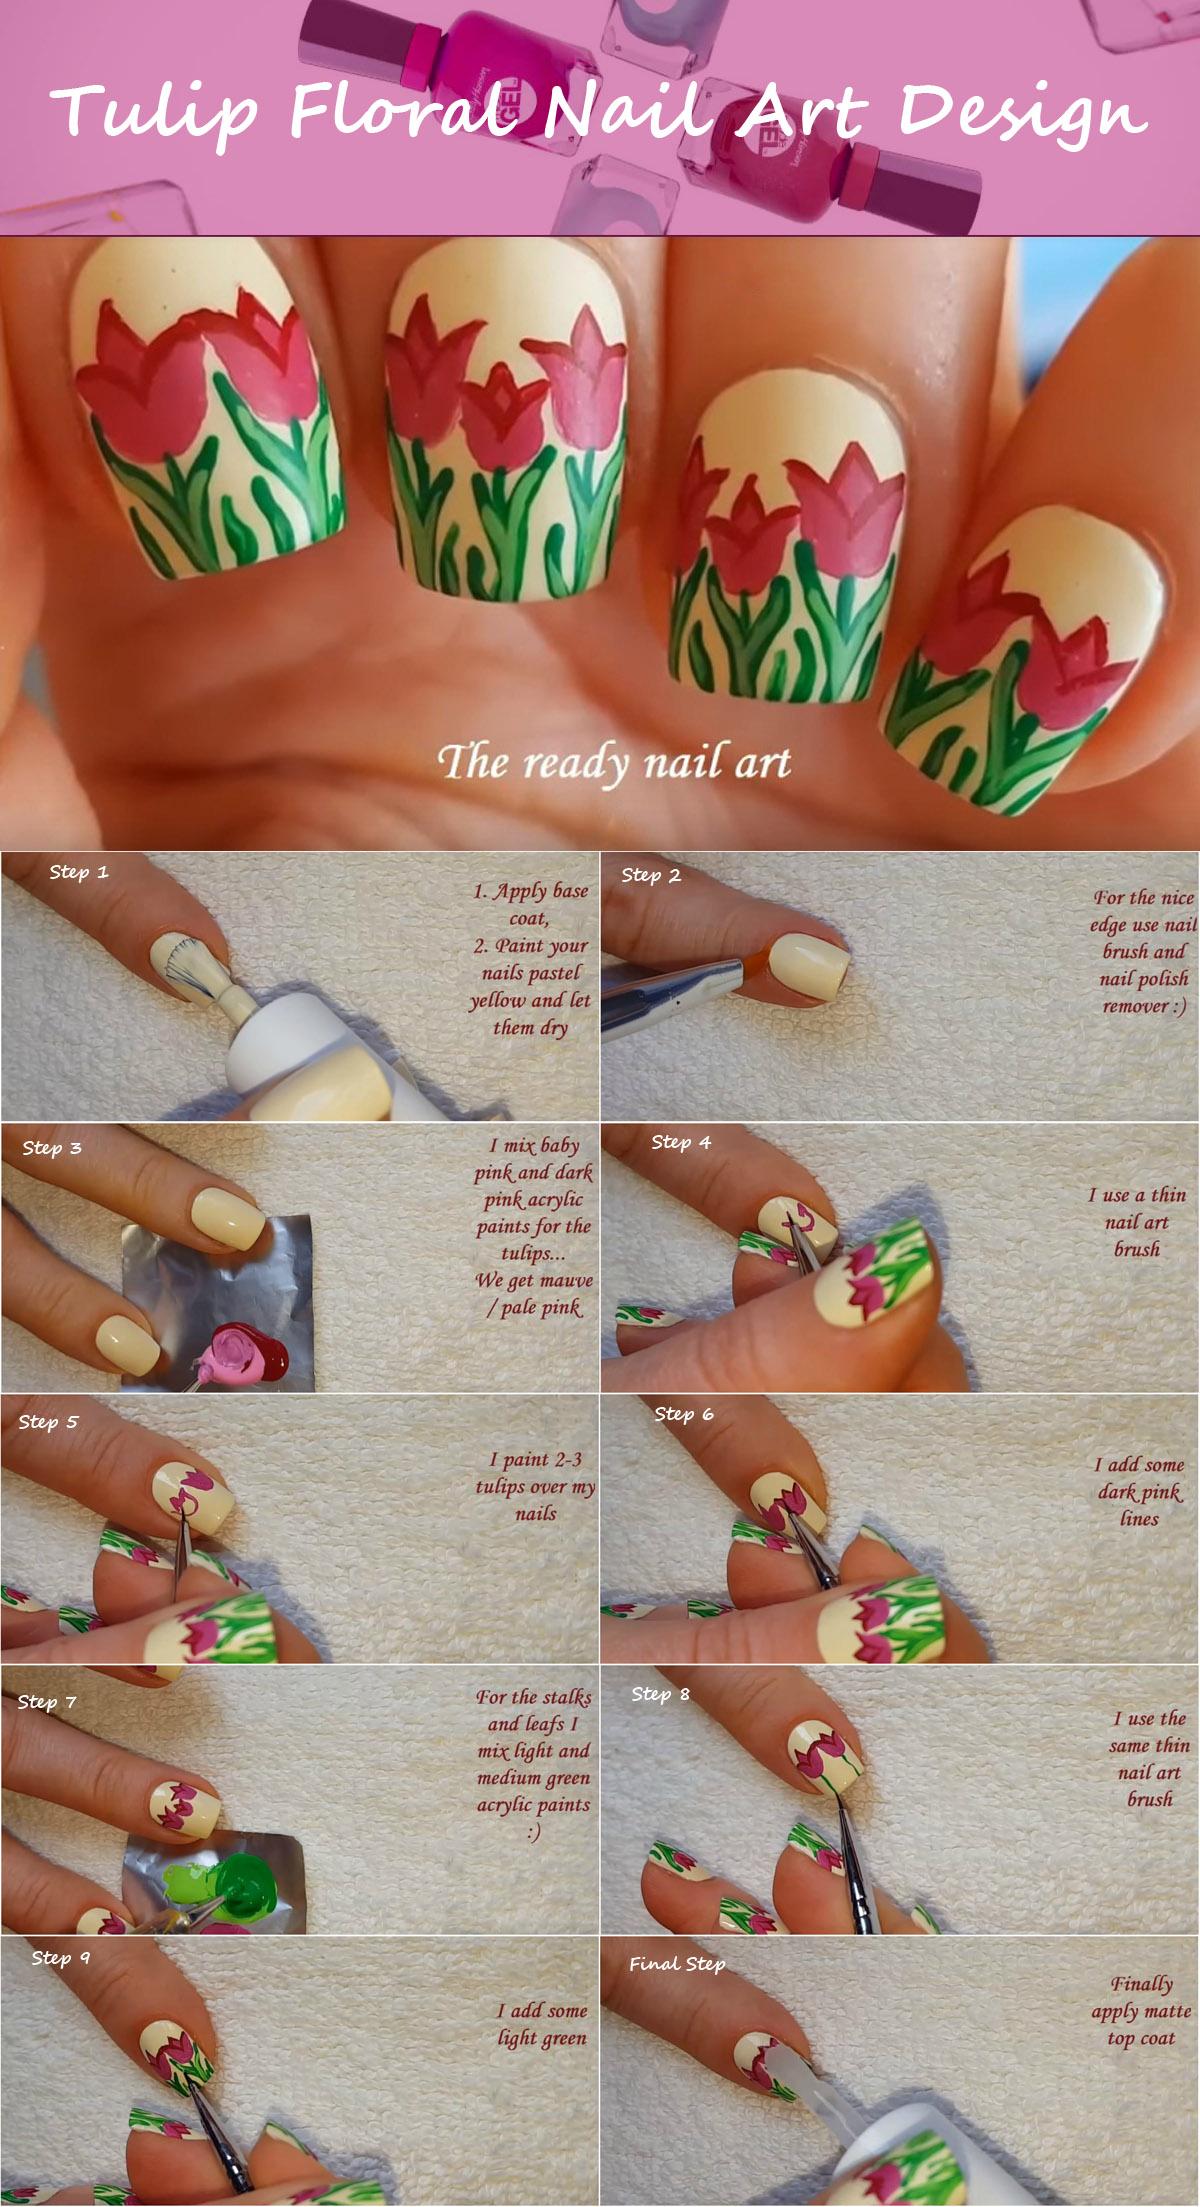 tulip-floral-nail-art-design